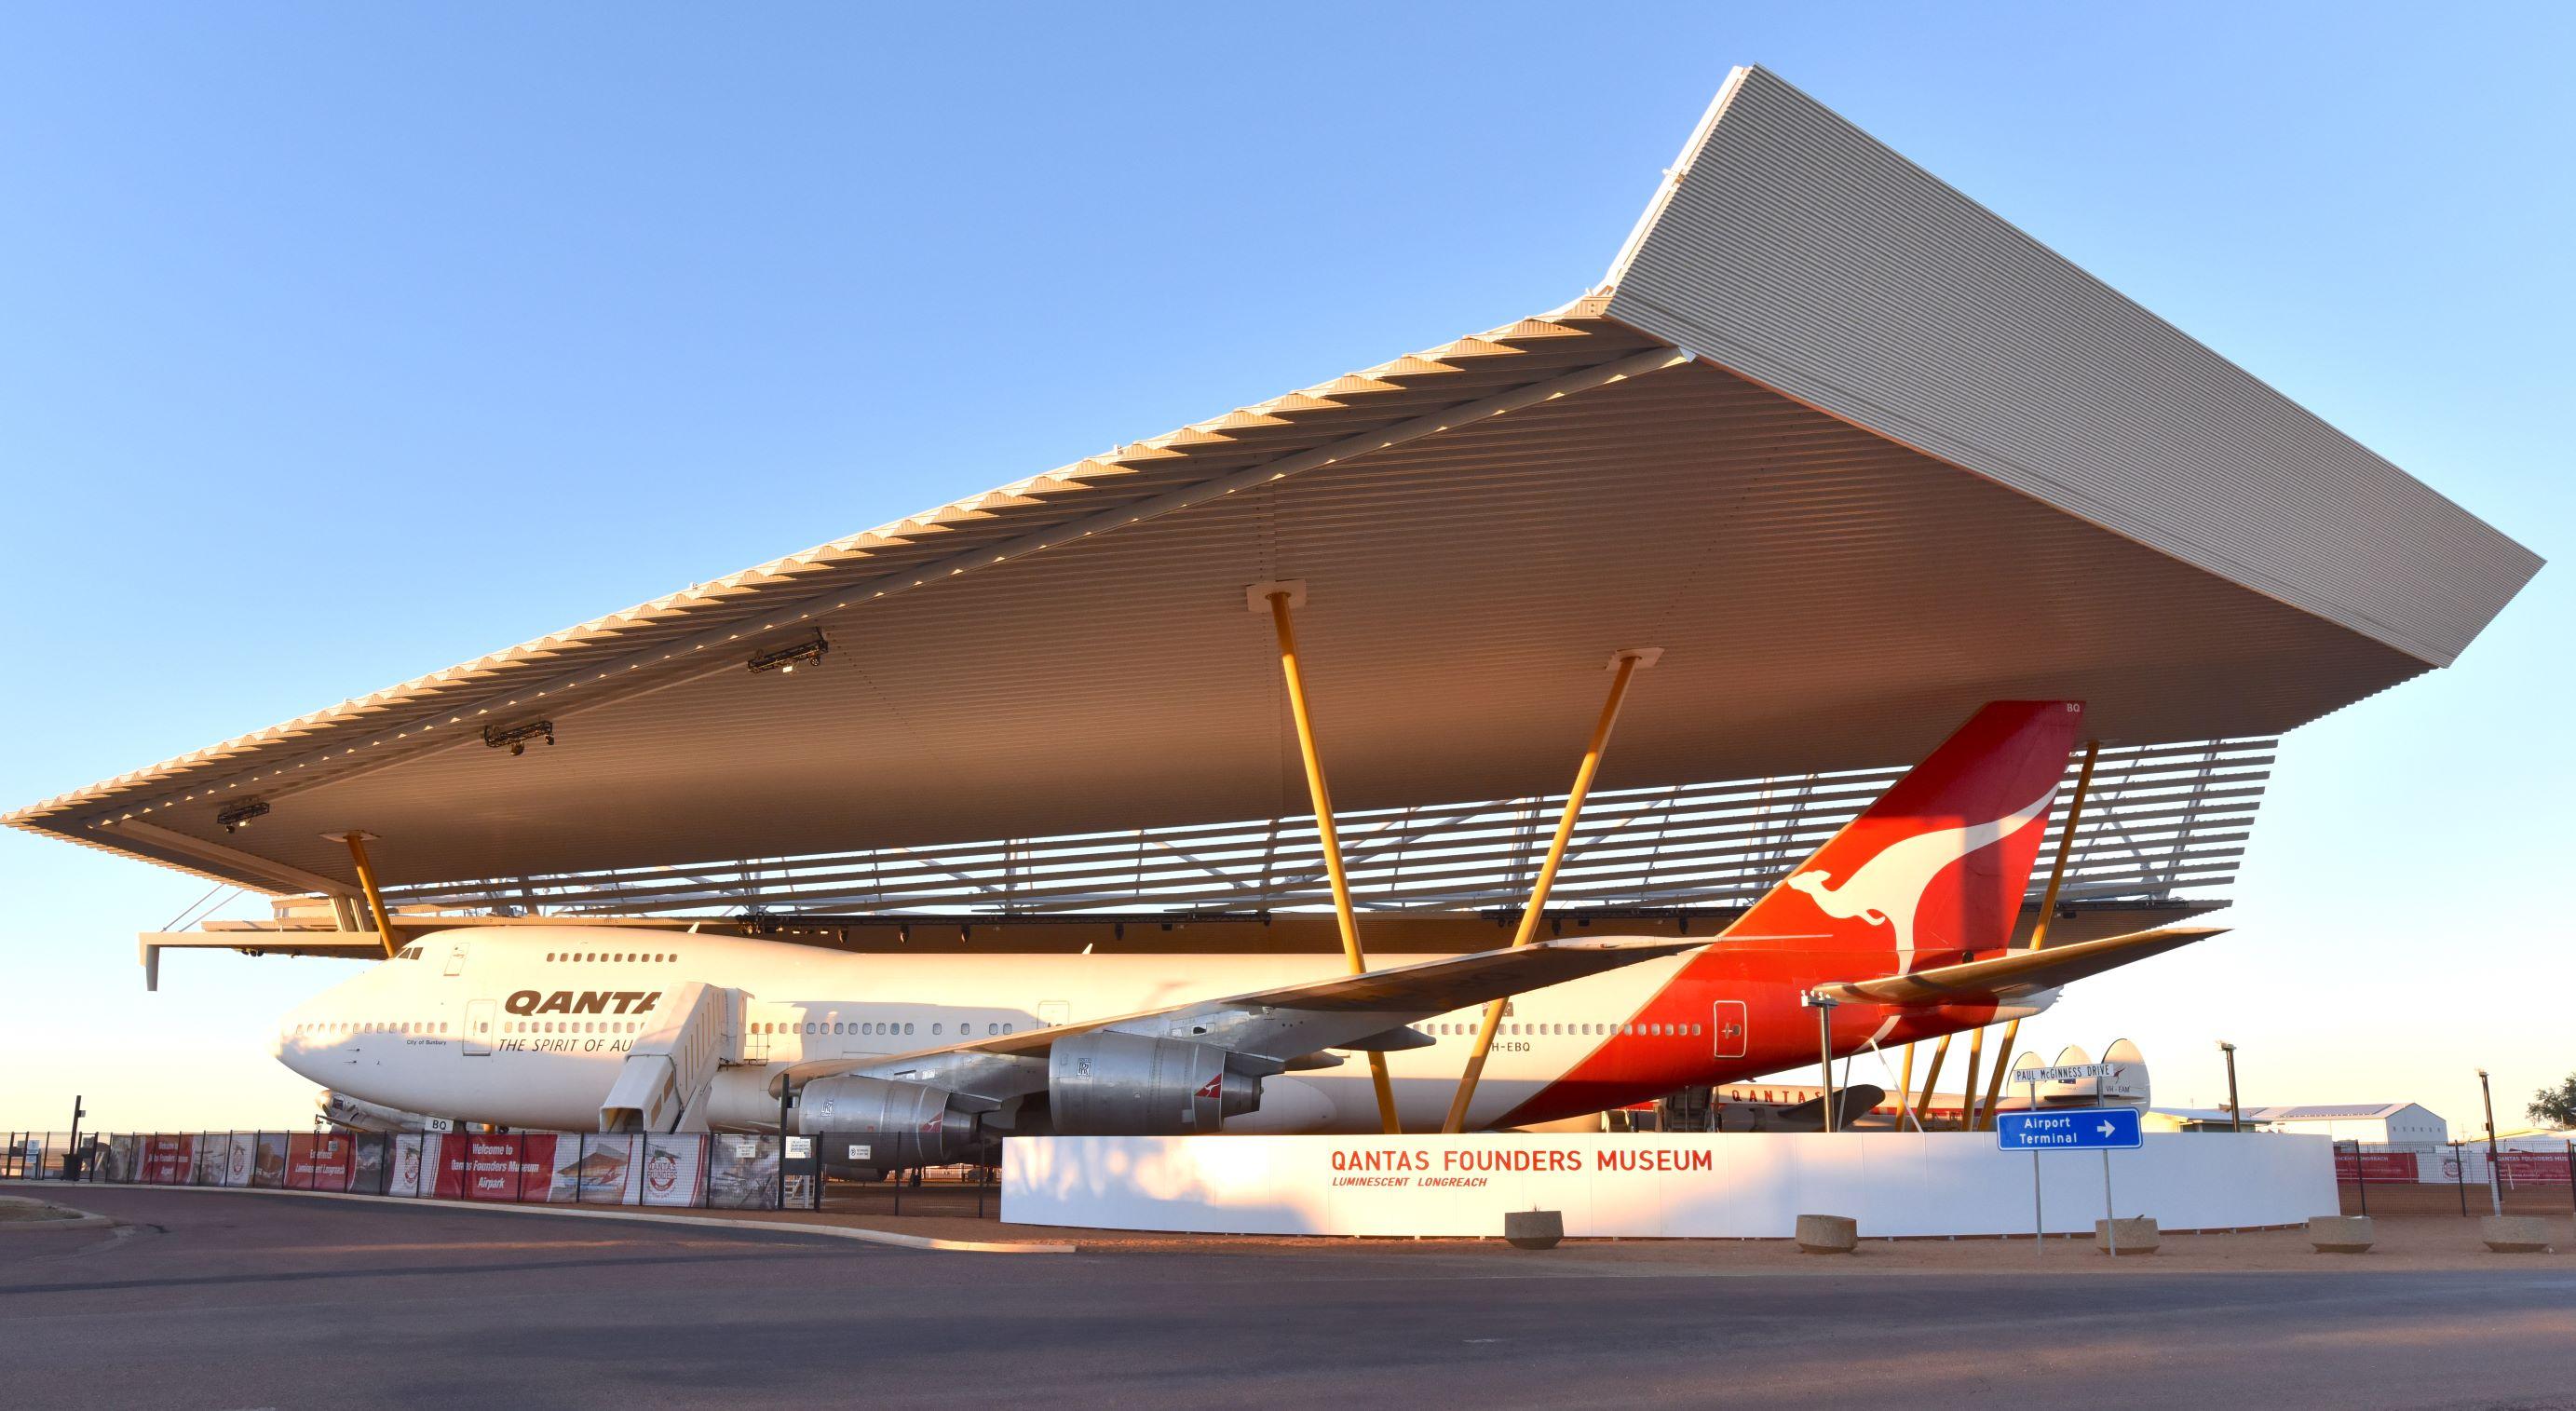 Qantas Founders Outback Museum